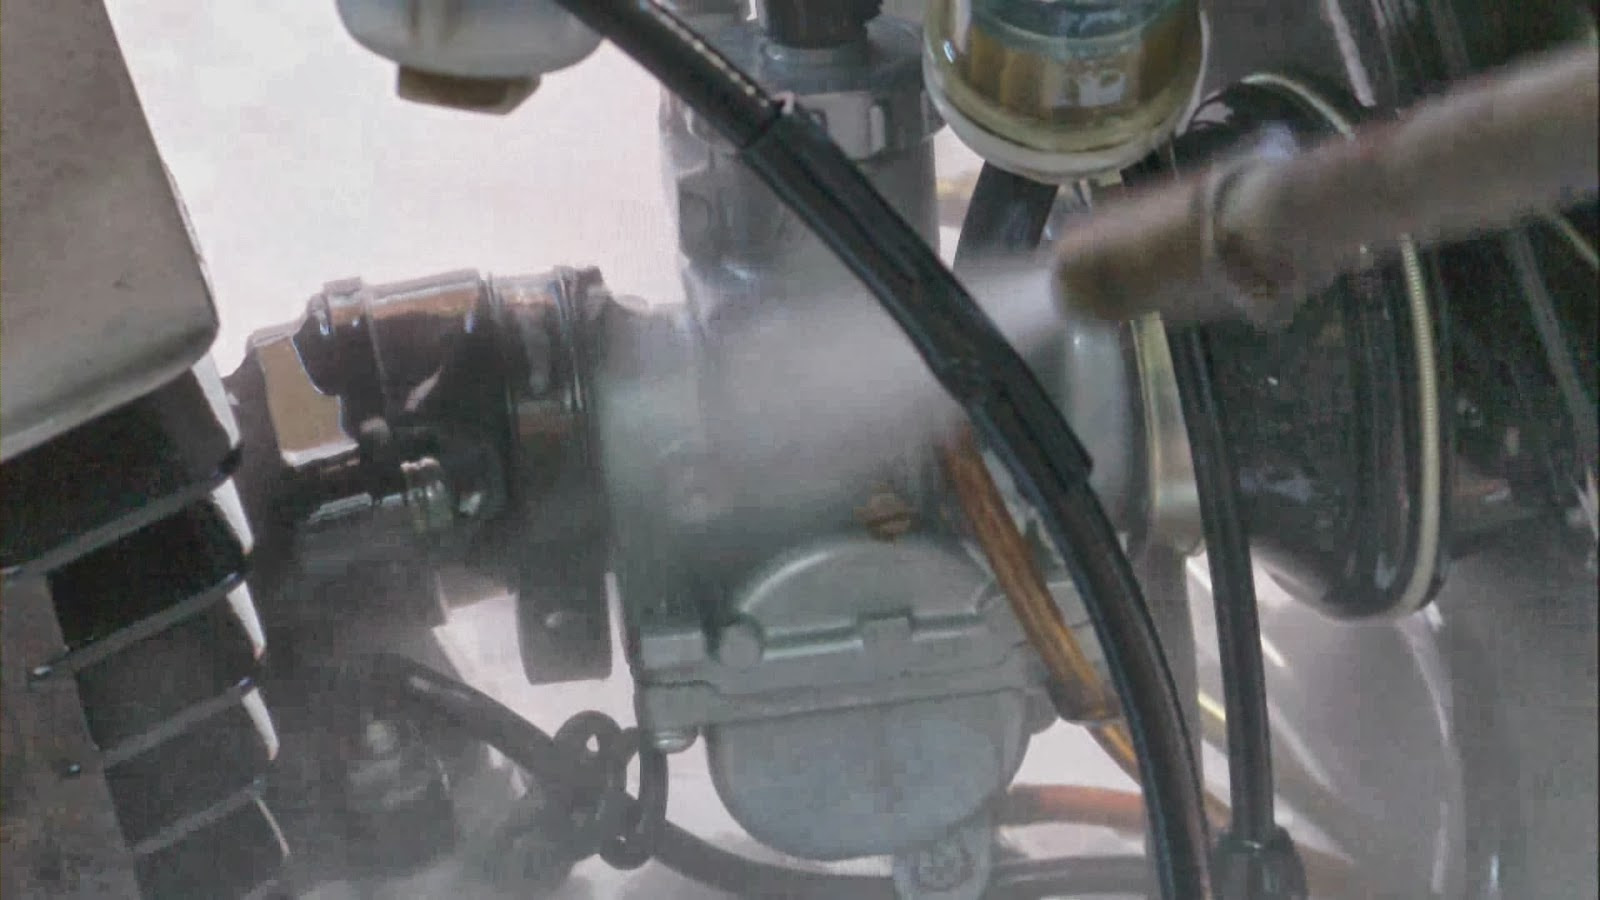 Suzuki AX Pasi N Por T Mikuni Limpieza Exterior